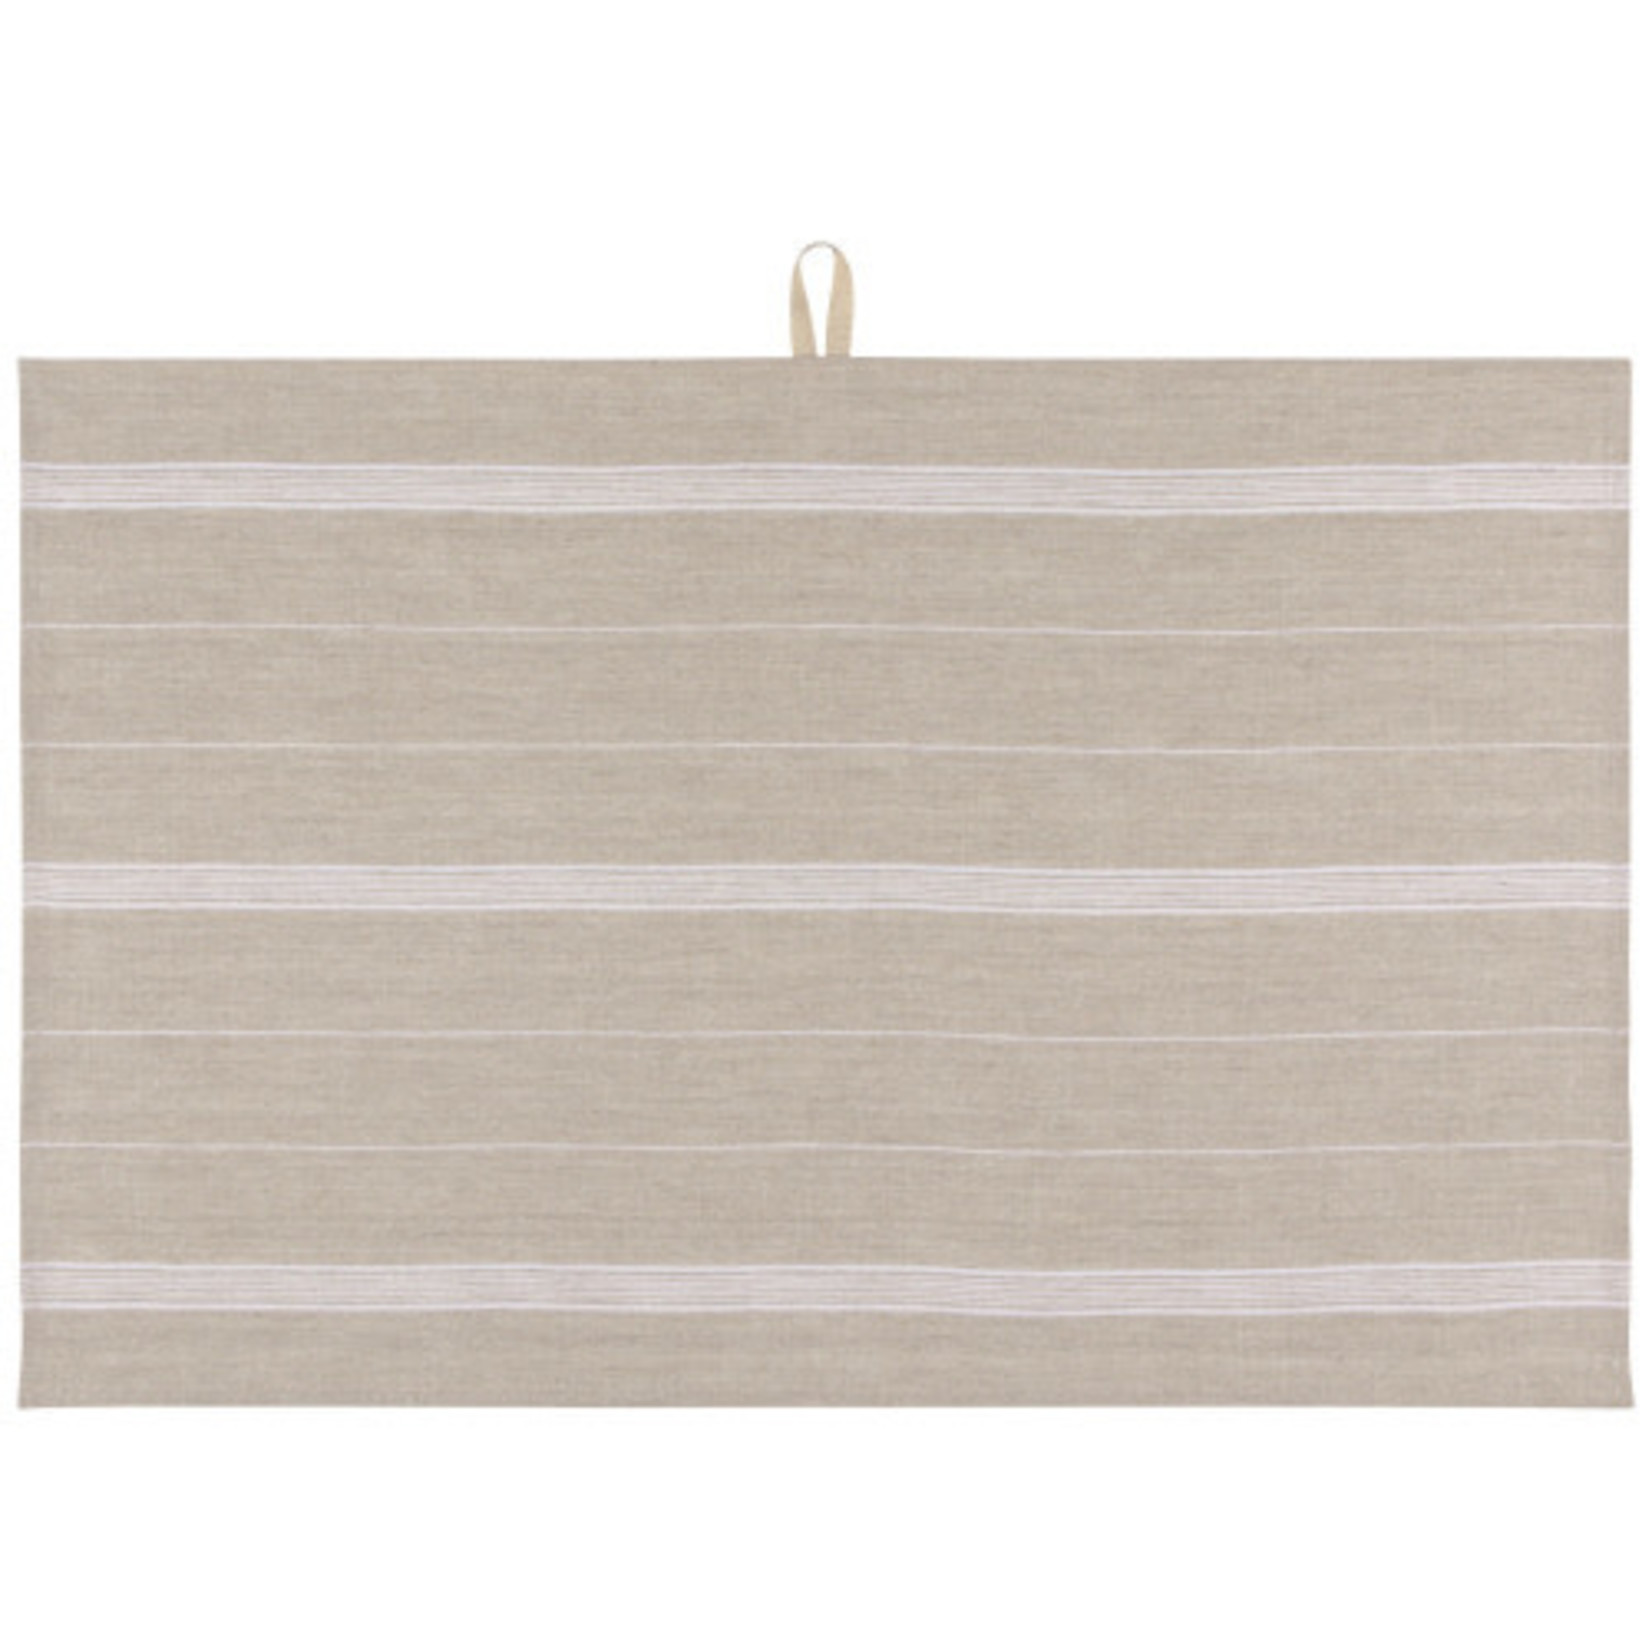 Maison Stripe Tea Towel in White